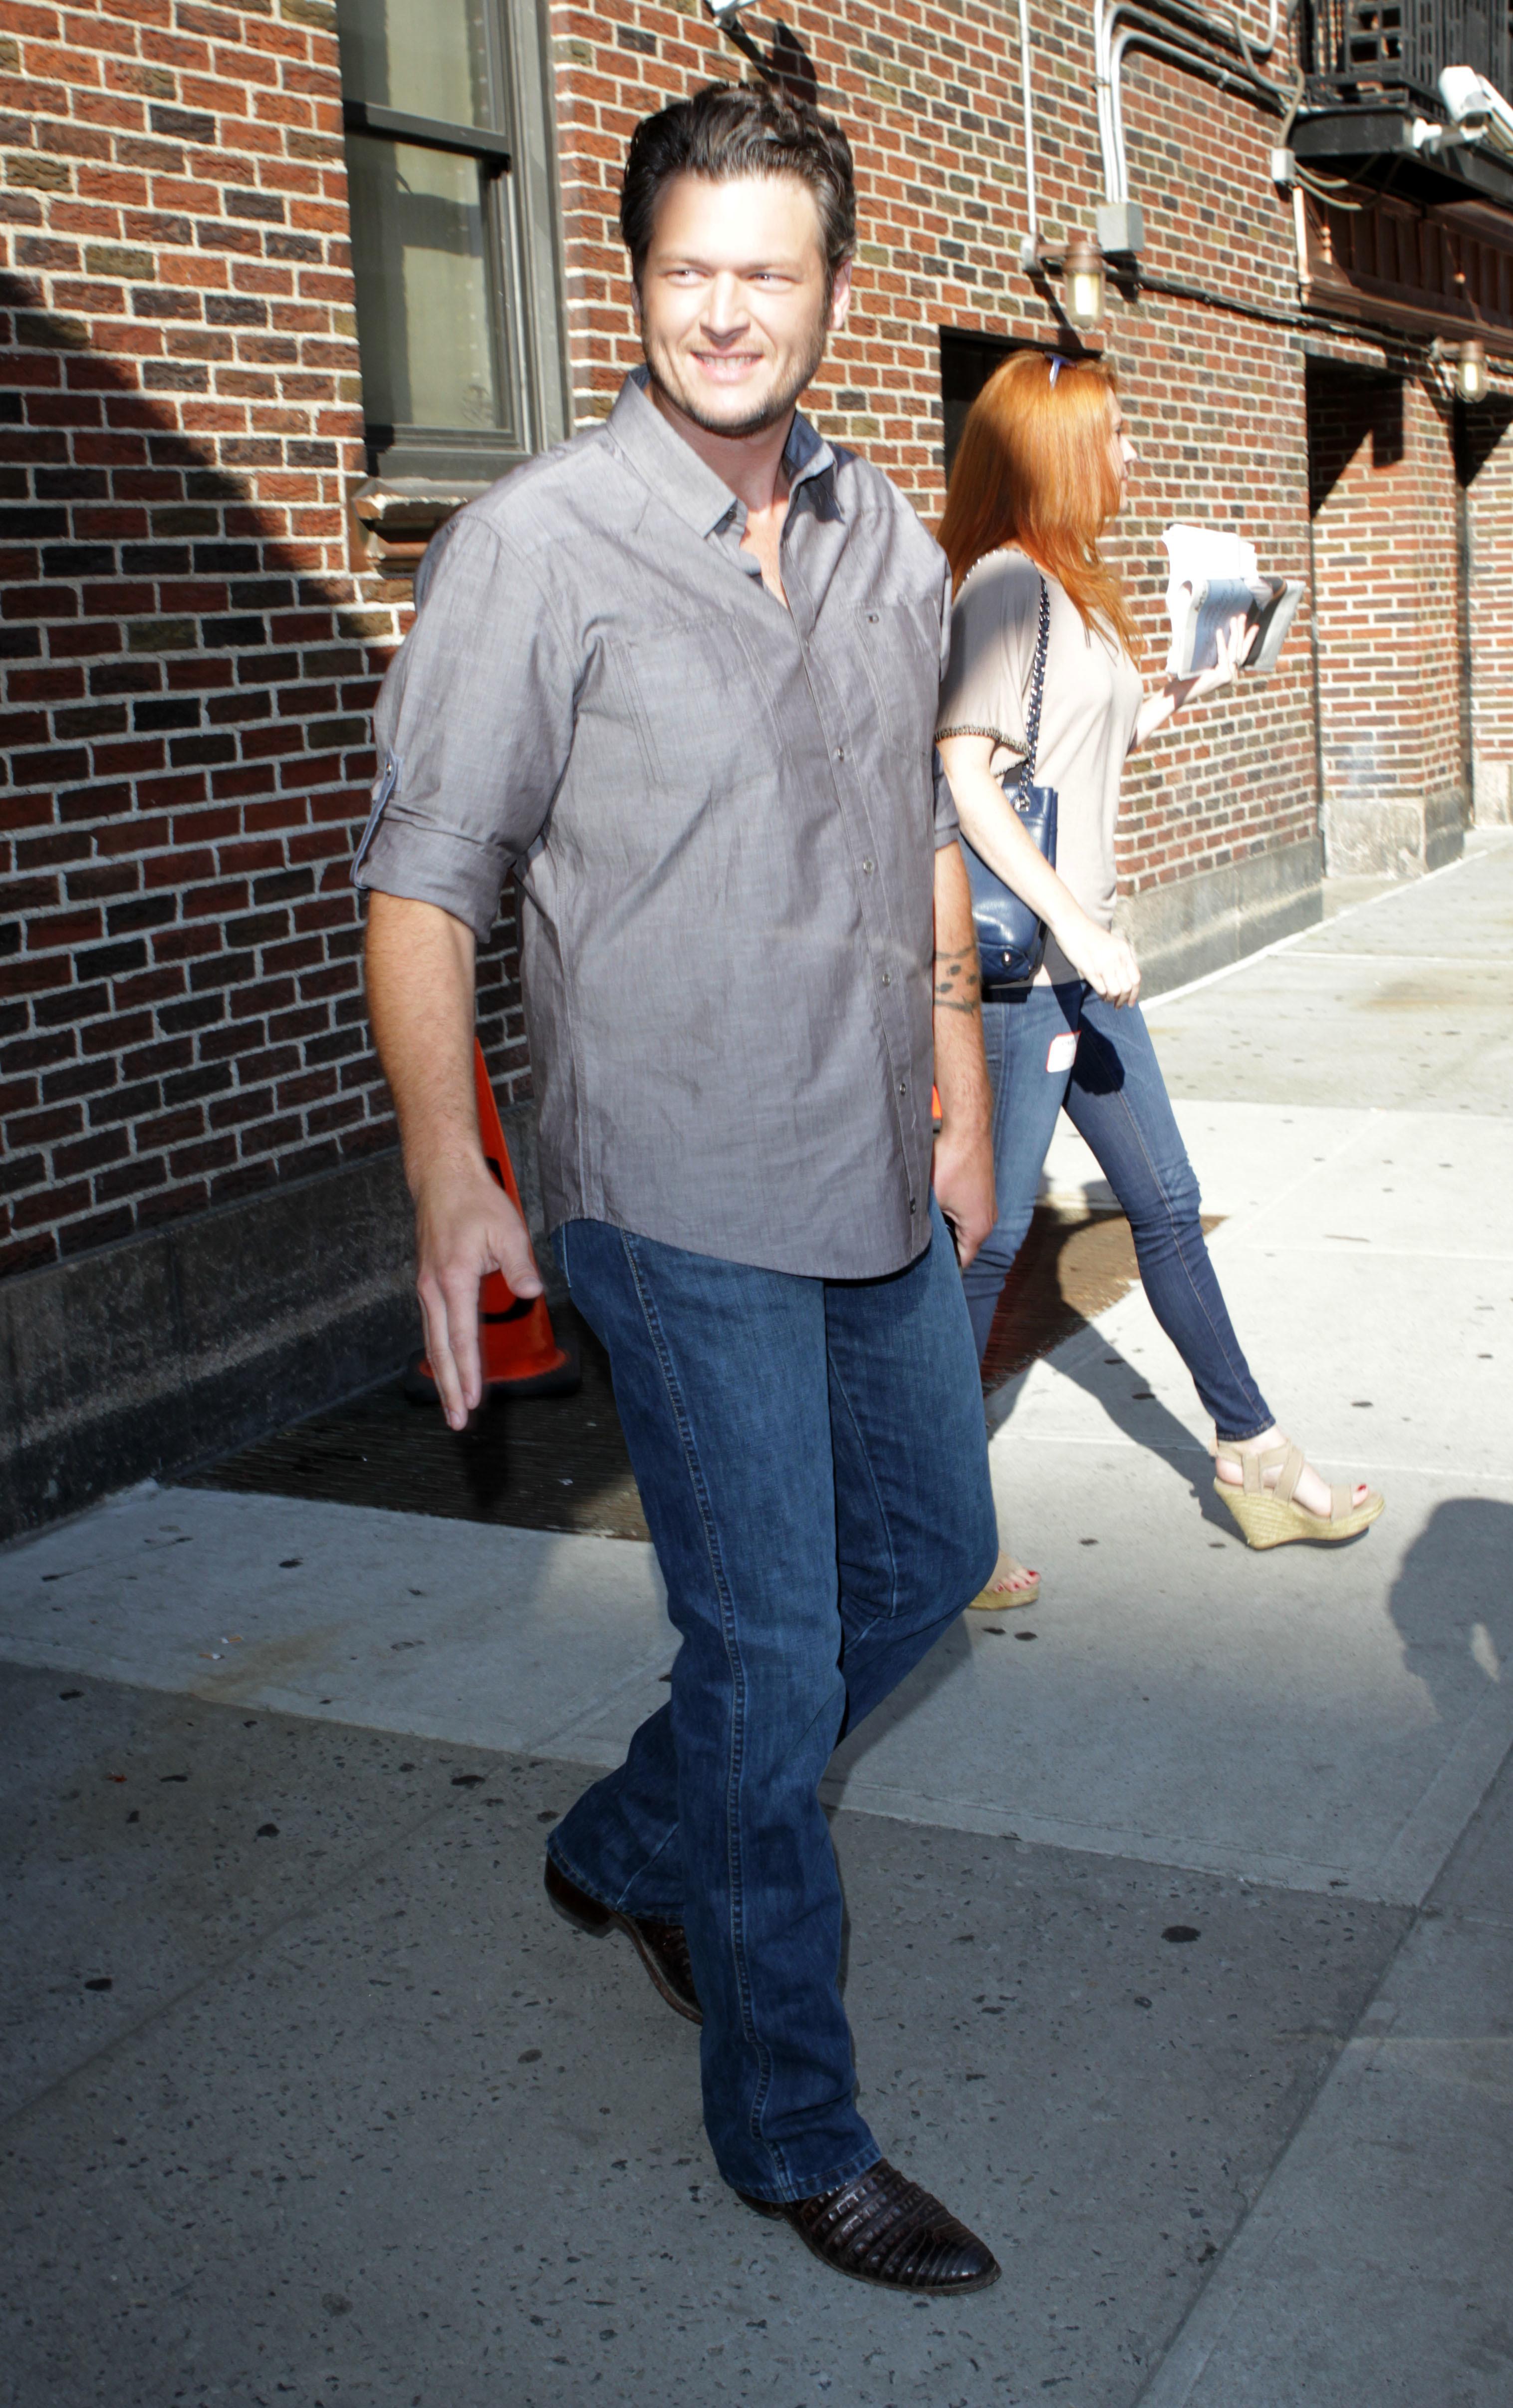 Blake Shelton Adam Levine David Letterman jeans